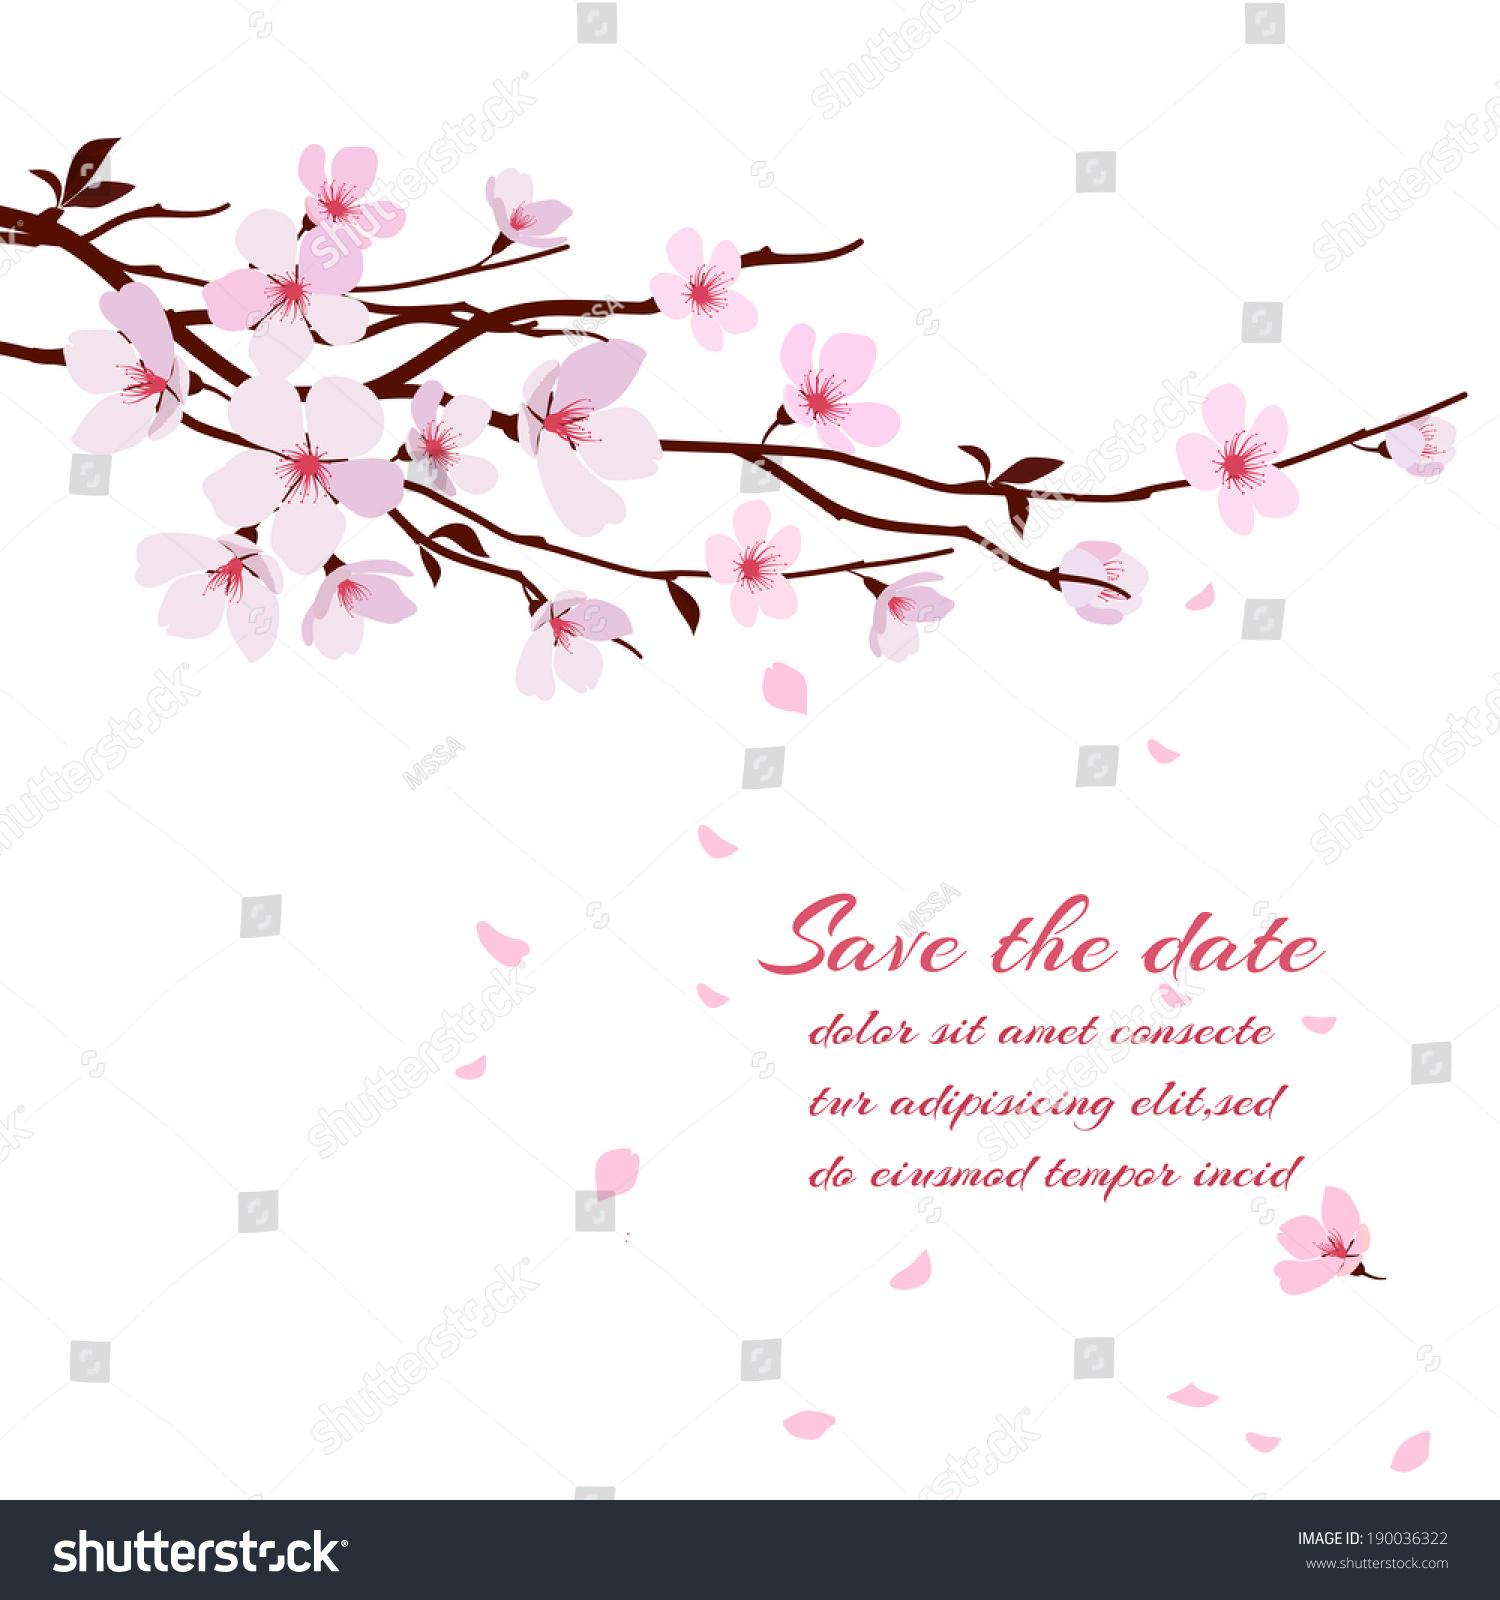 Cherry Blossoms Falling Stylized Wallpaper Cherry Blossom Sakura Branch Pink Flowers Stock Vector